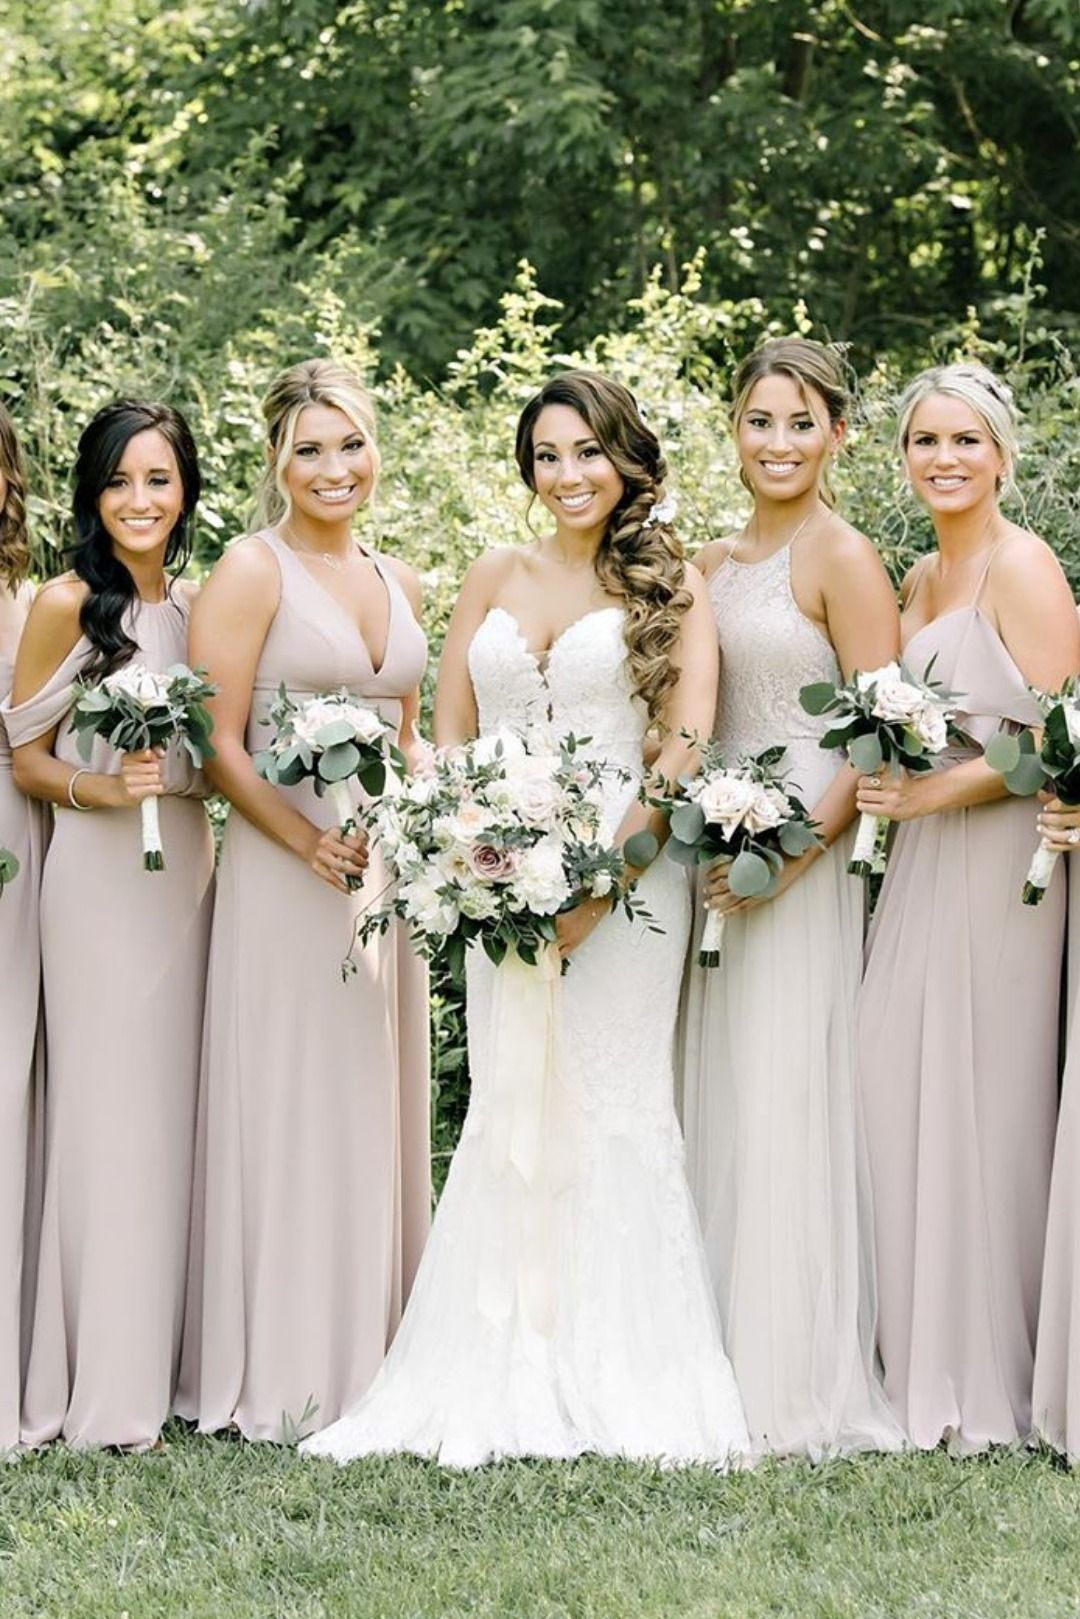 Shop By Neutral Brideside Neutral Bridesmaid Dresses Rustic Bridesmaid Dresses Taupe Bridesmaid